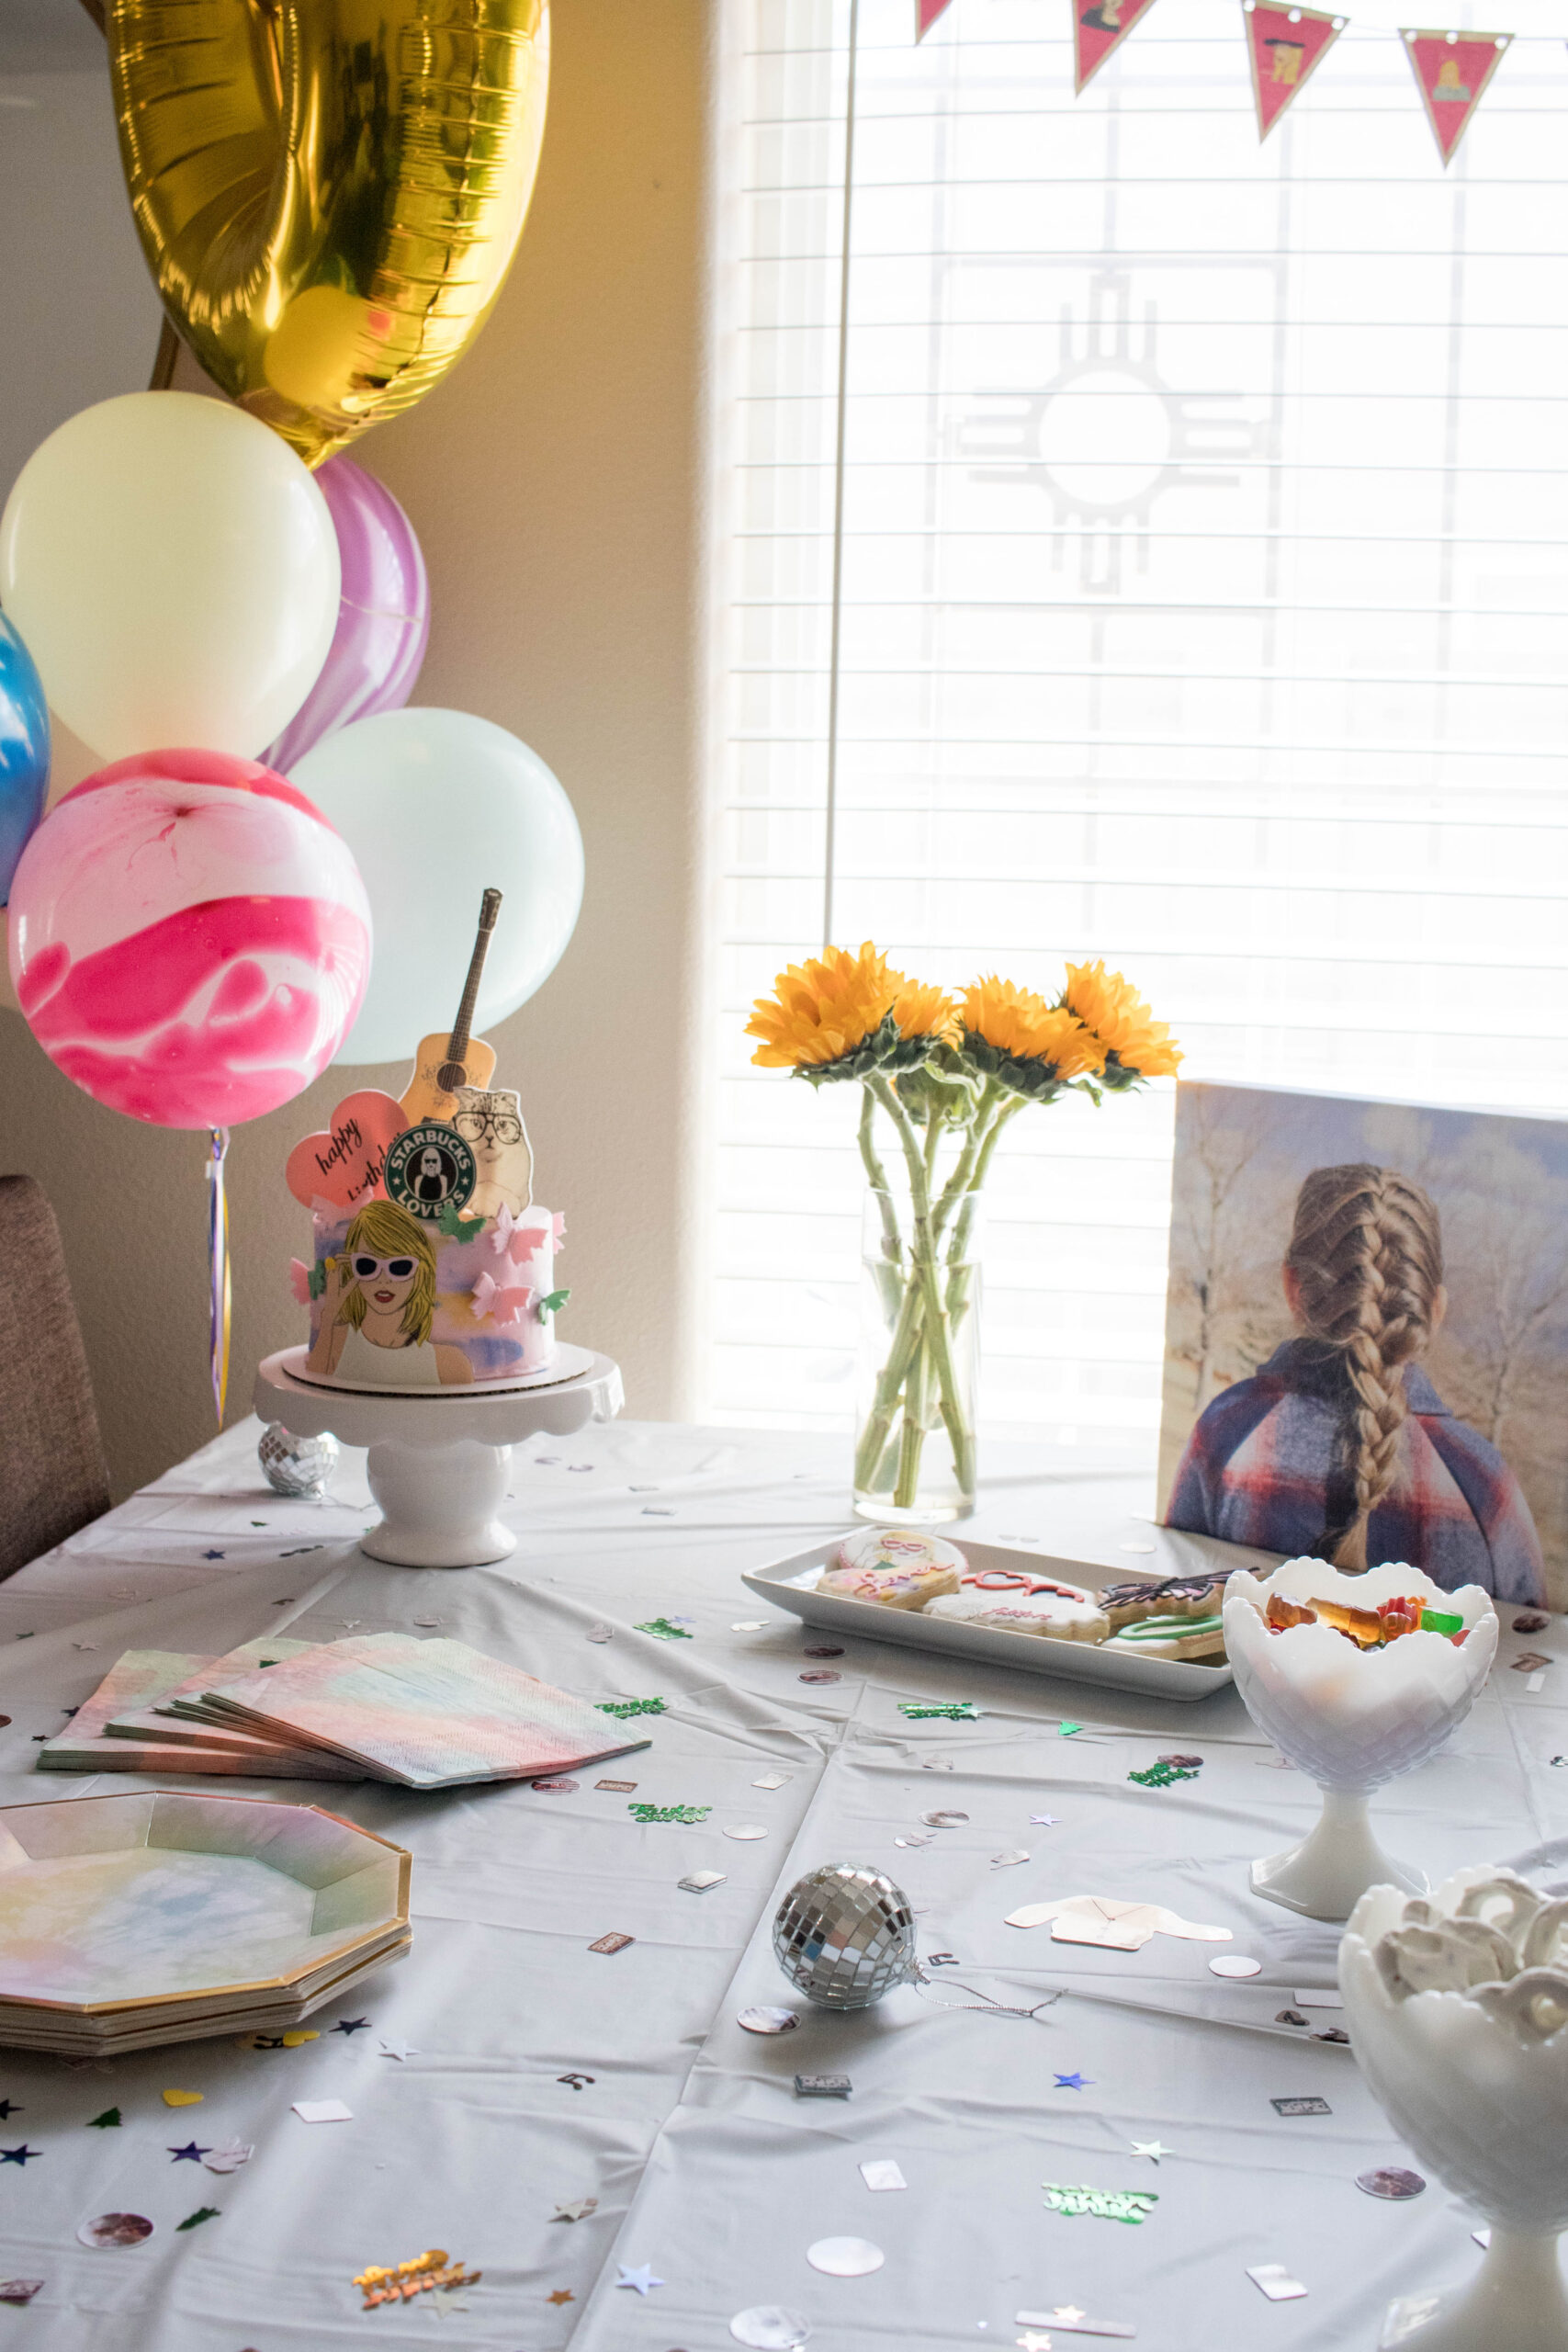 Taylor Swift themed birthday party decor #taylorswiftparty #birthdaypartyideas #girlsbirthdayparty